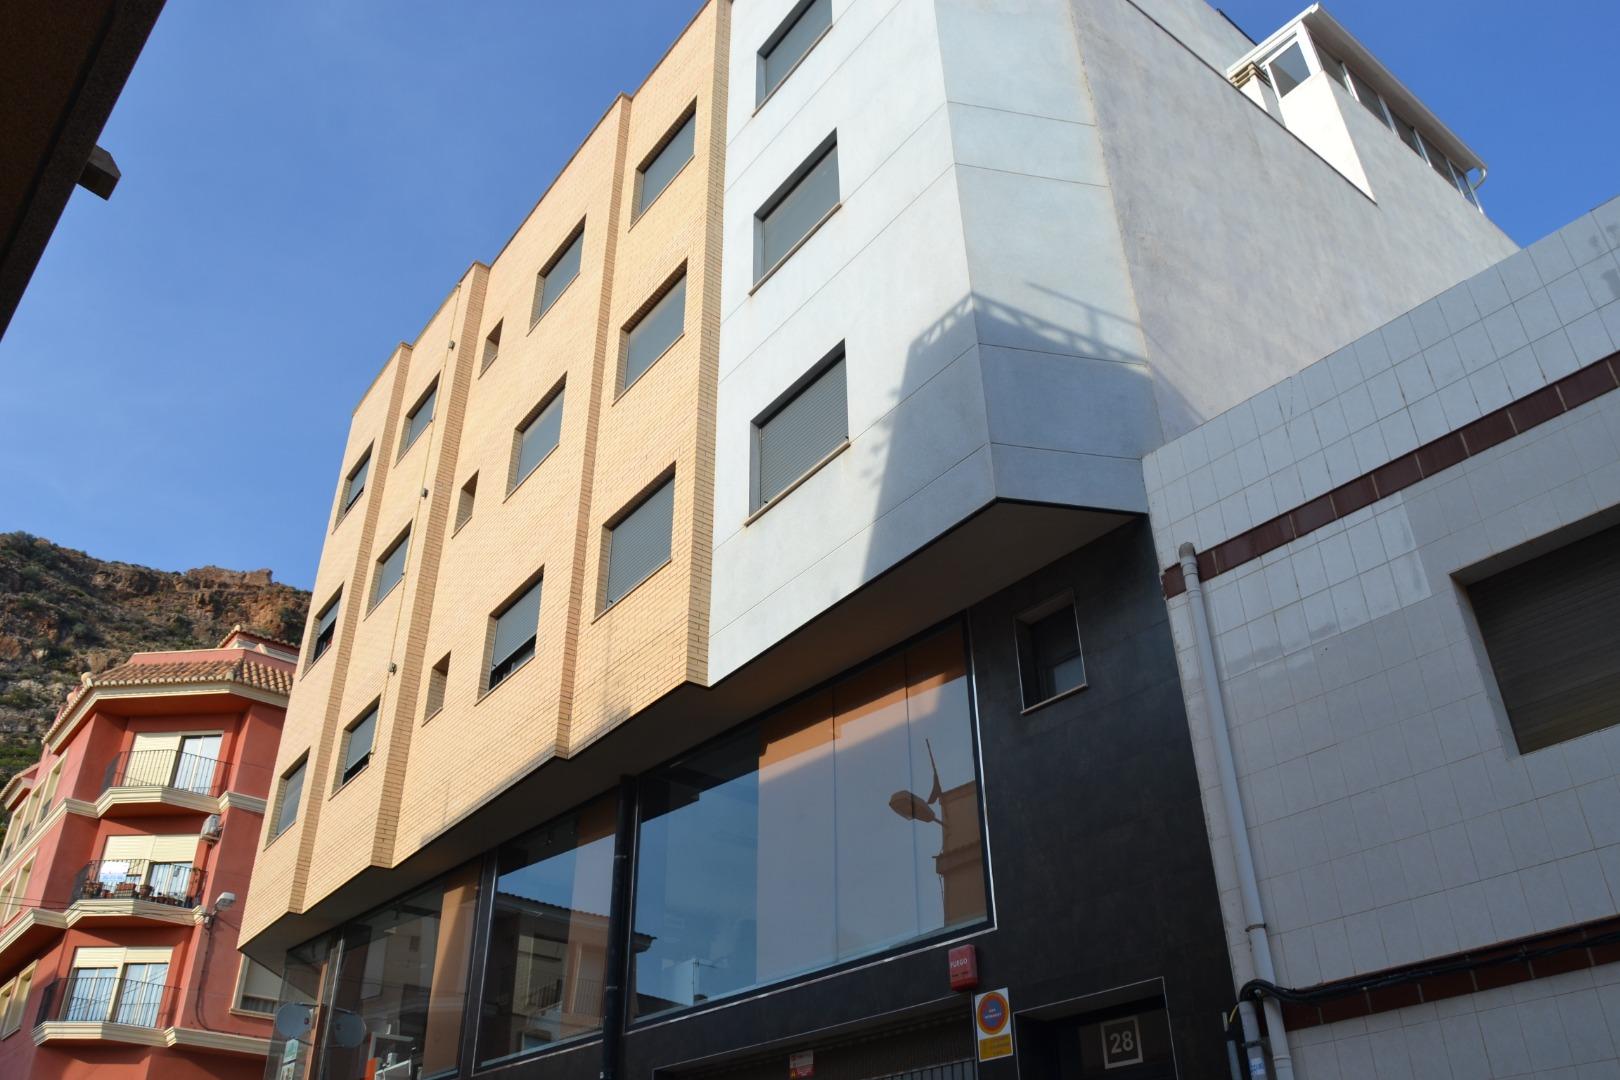 Lloguer Pis  Calle jaime i, 28. ! piso semi nuevo vacio en Almenara !